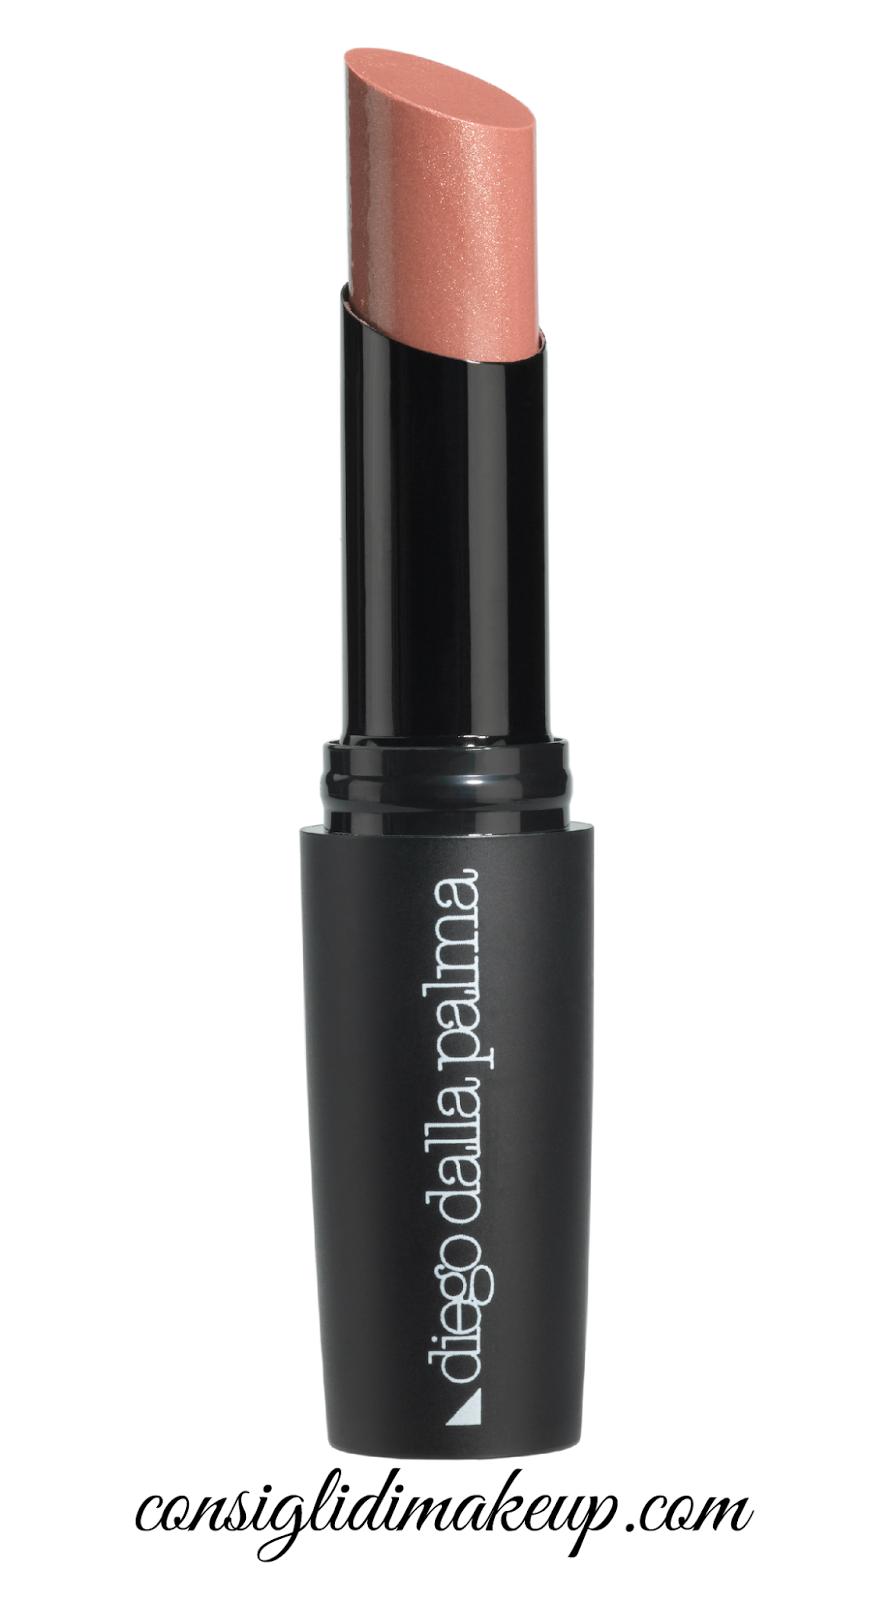 shiny lipstick diego dalla palma 195 ai 2014